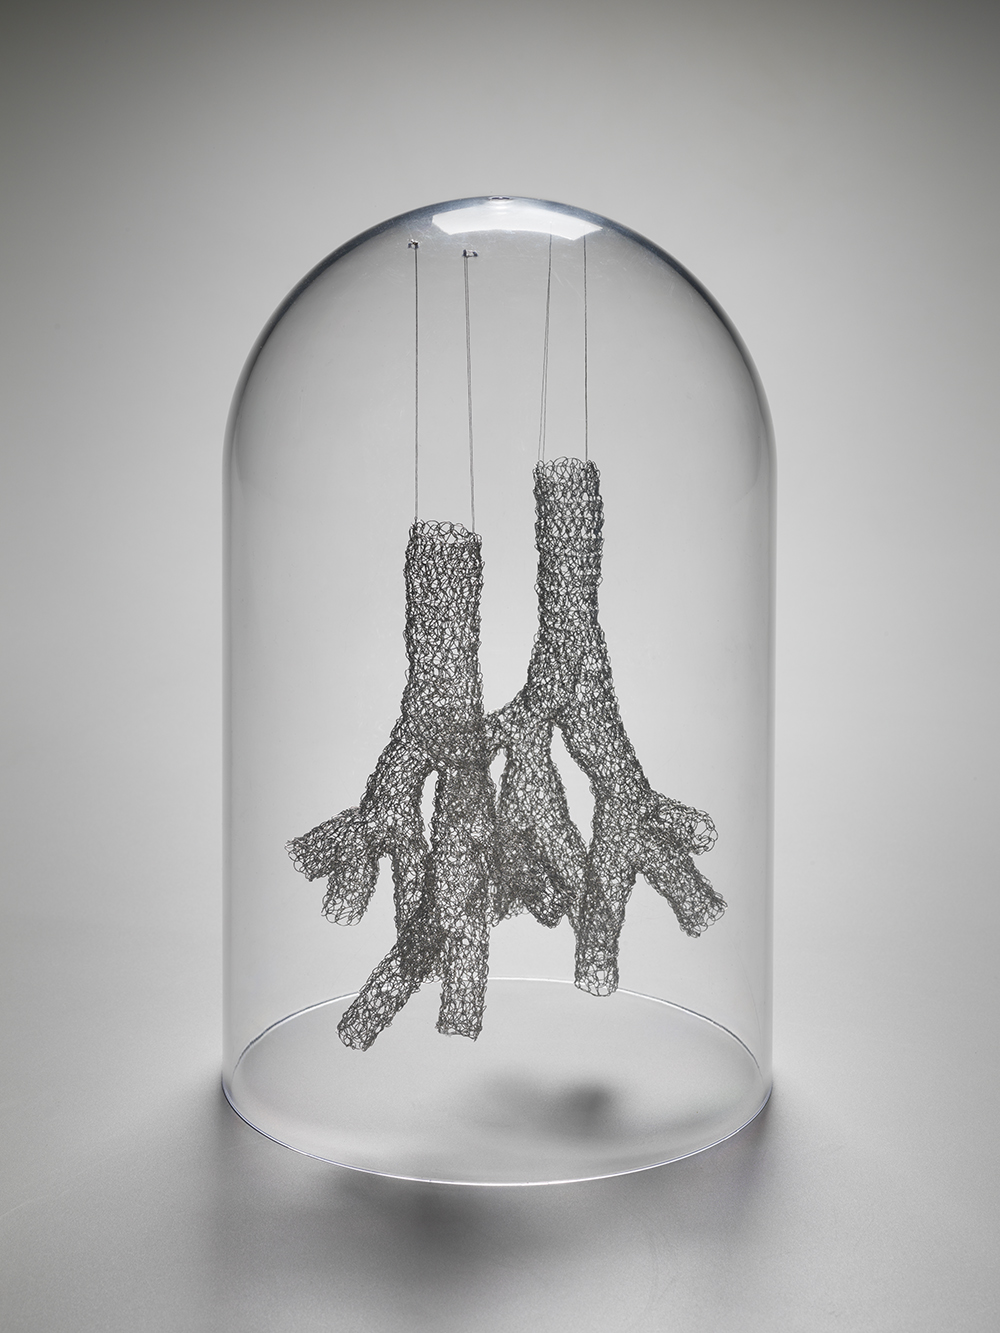 crocheted sculptures